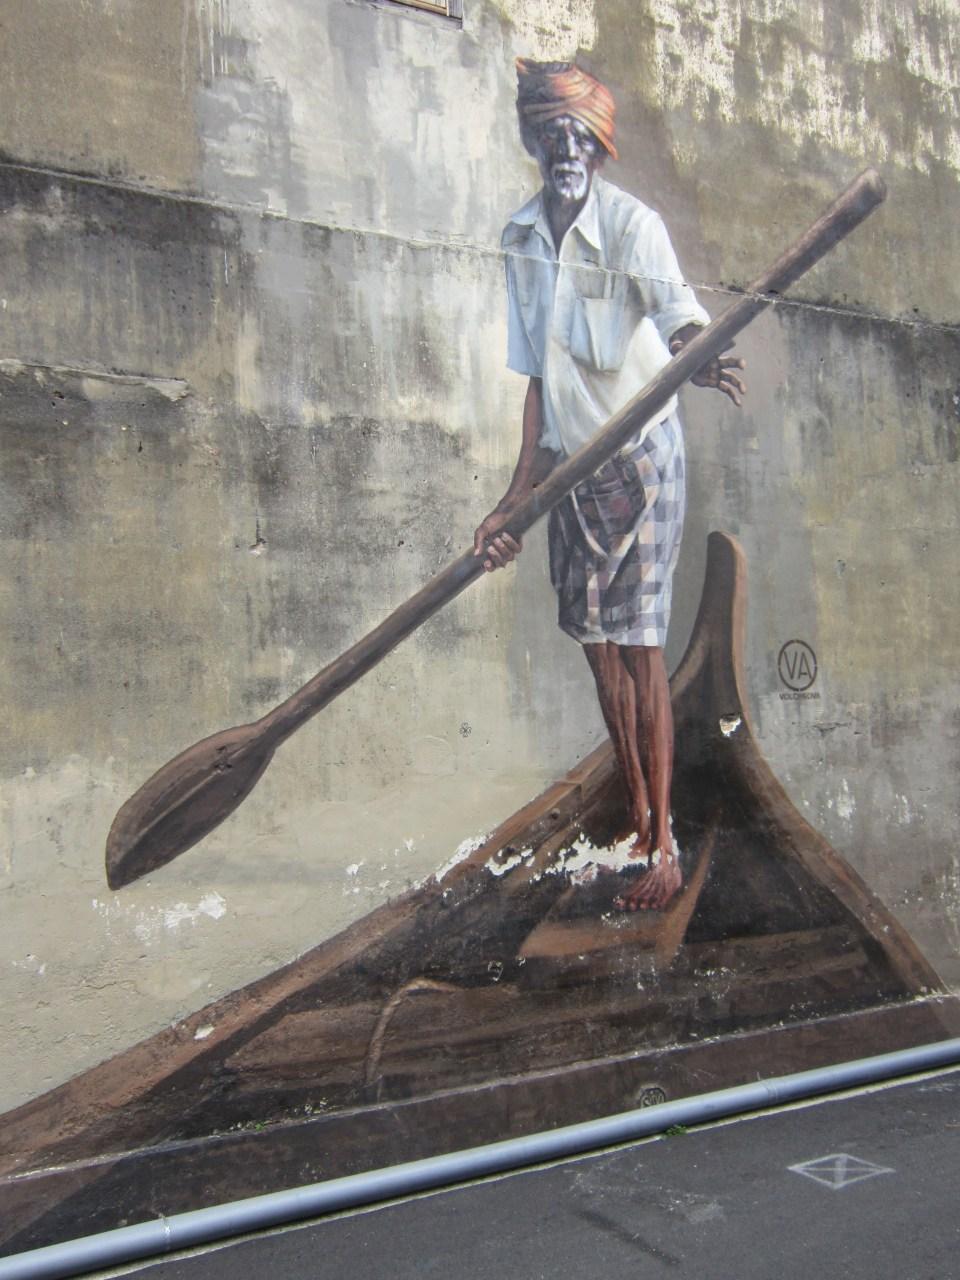 Penang Street Art Man paddling a boat